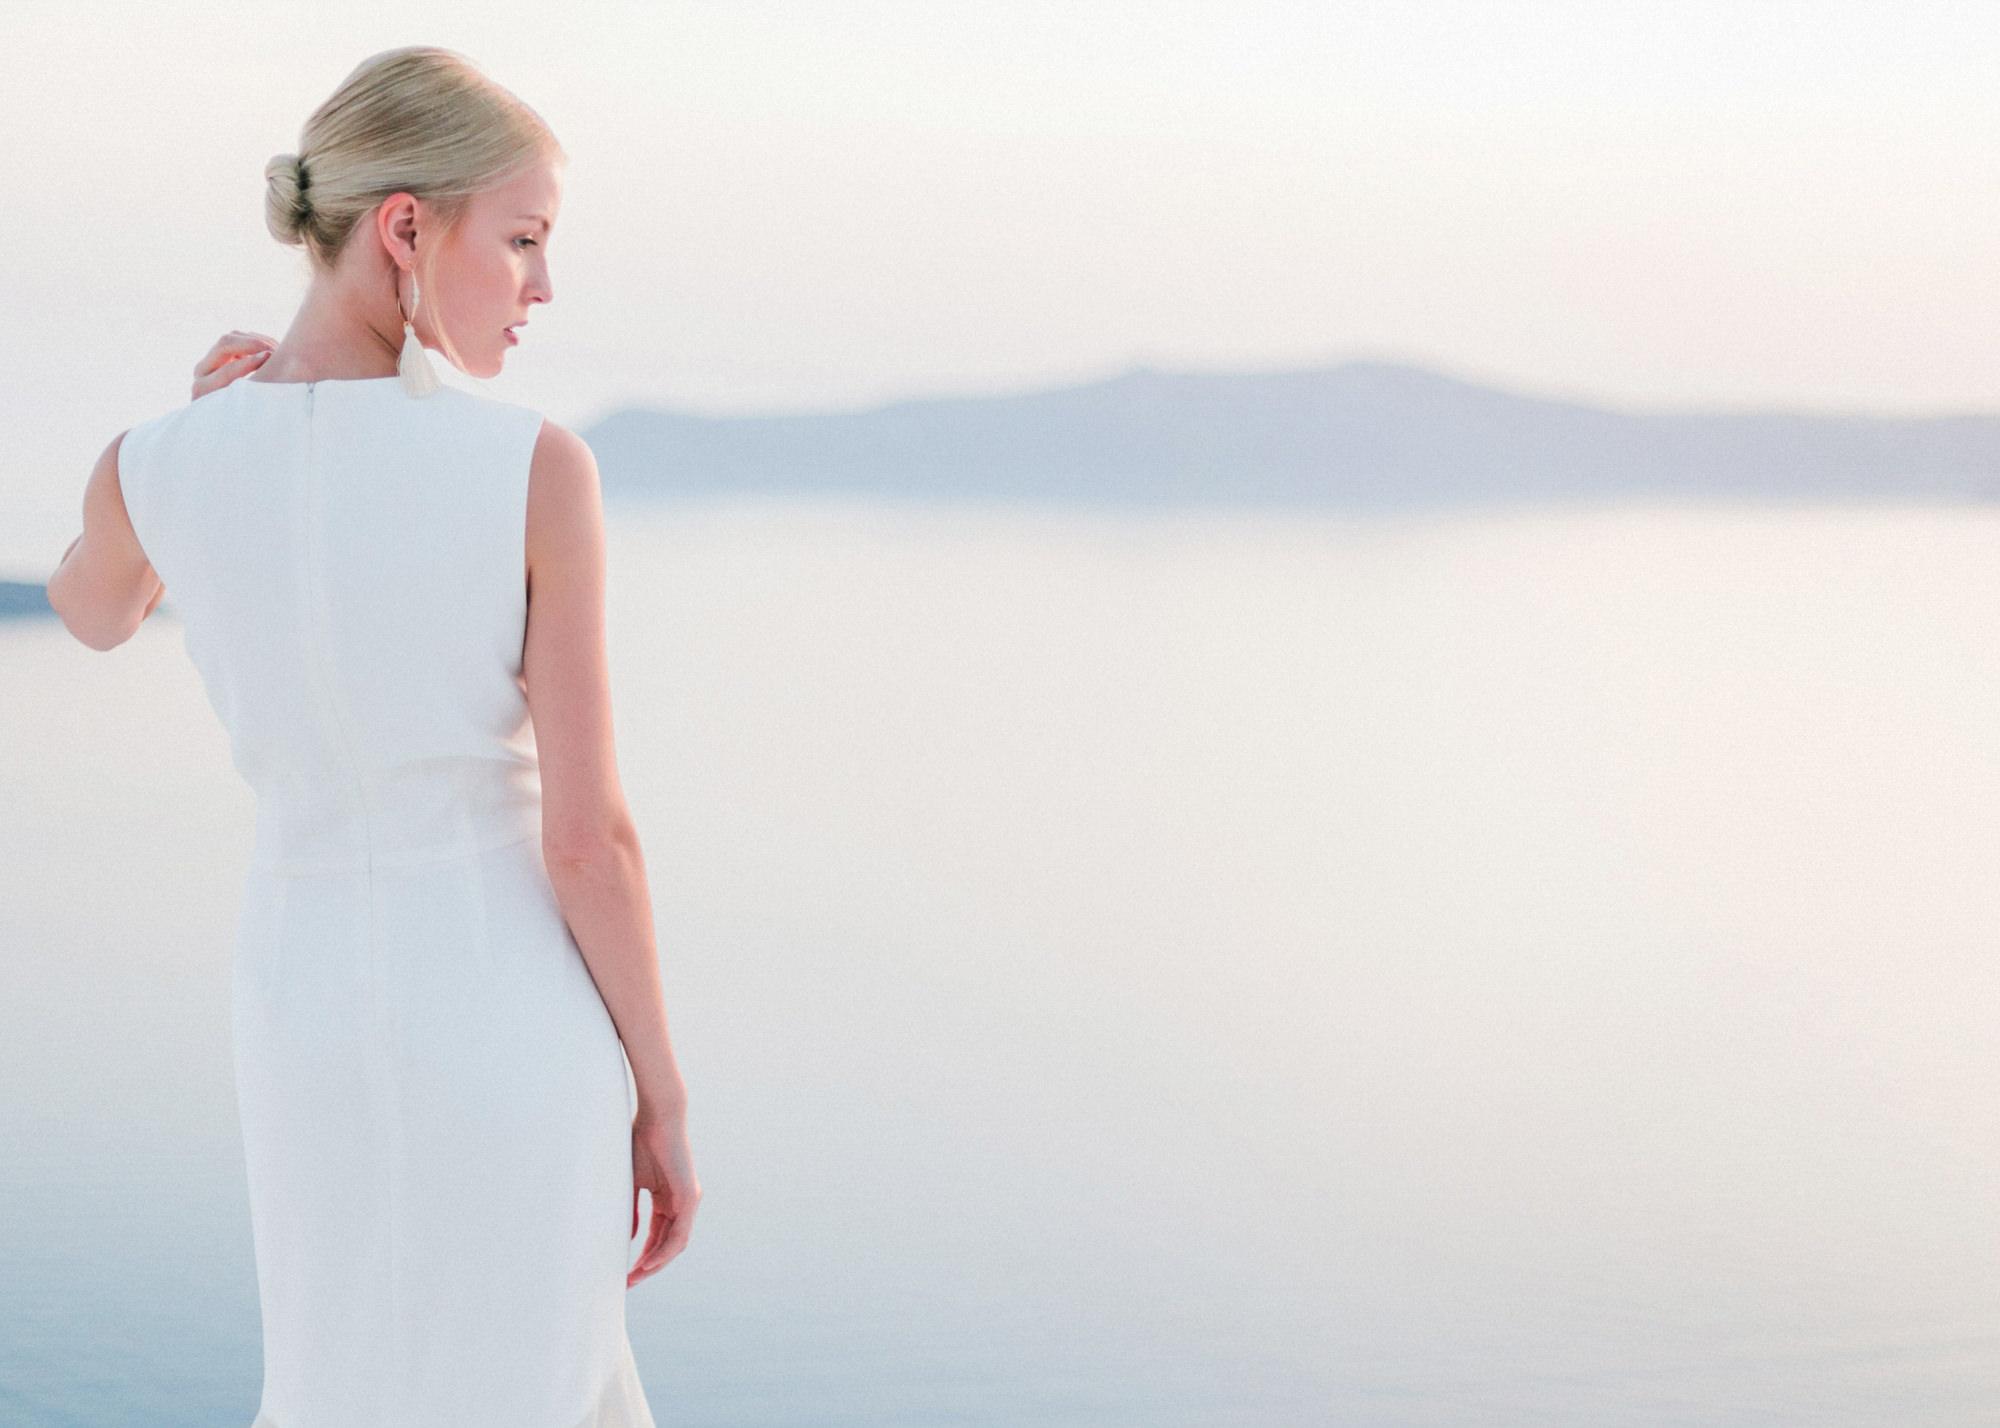 101-portrait-santorini-wedding-photographer-greece-b-v